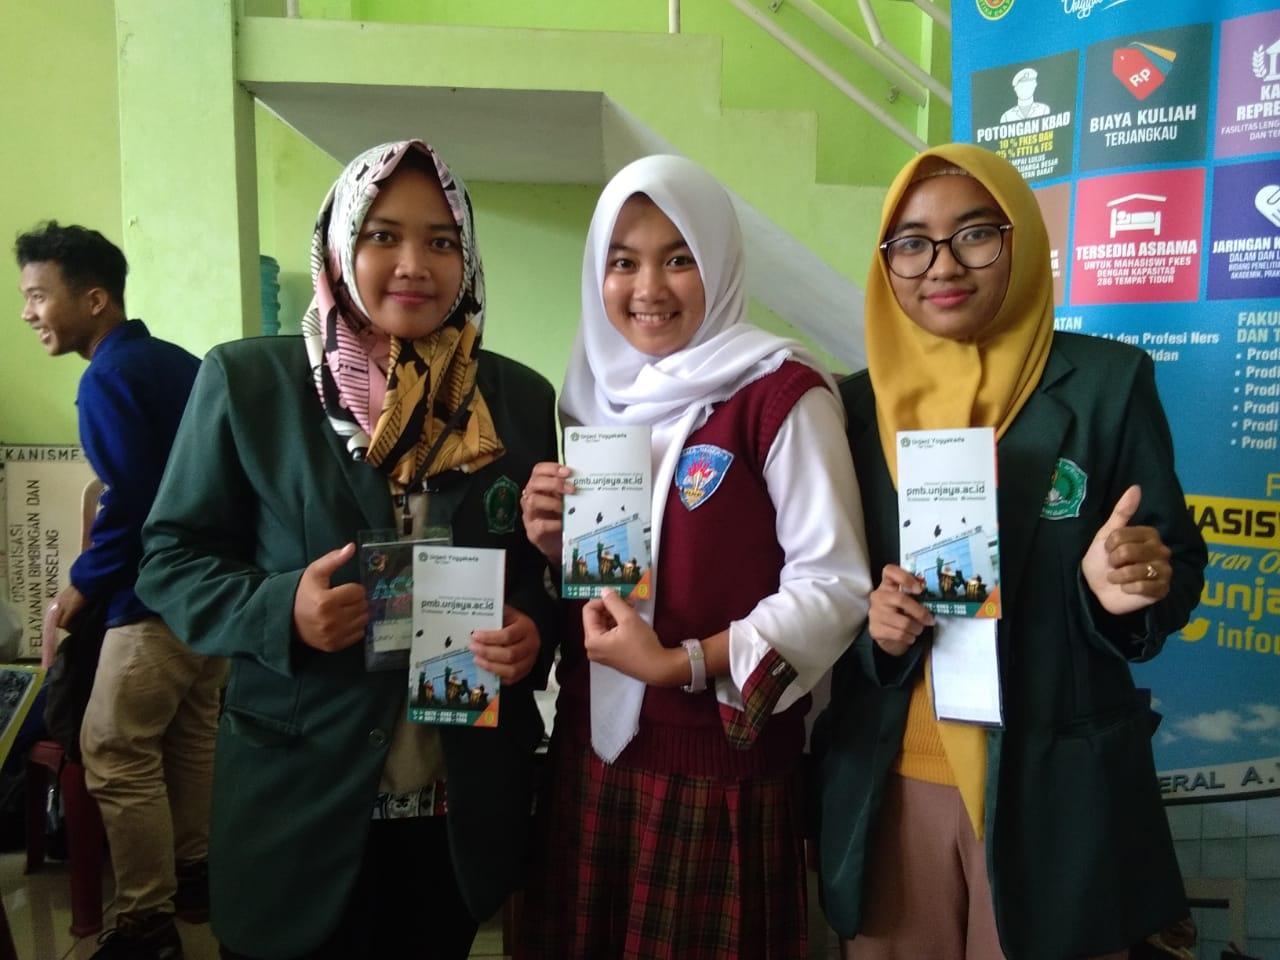 Survei Kepuasan Layanan PMB Unjani Yogyakarta